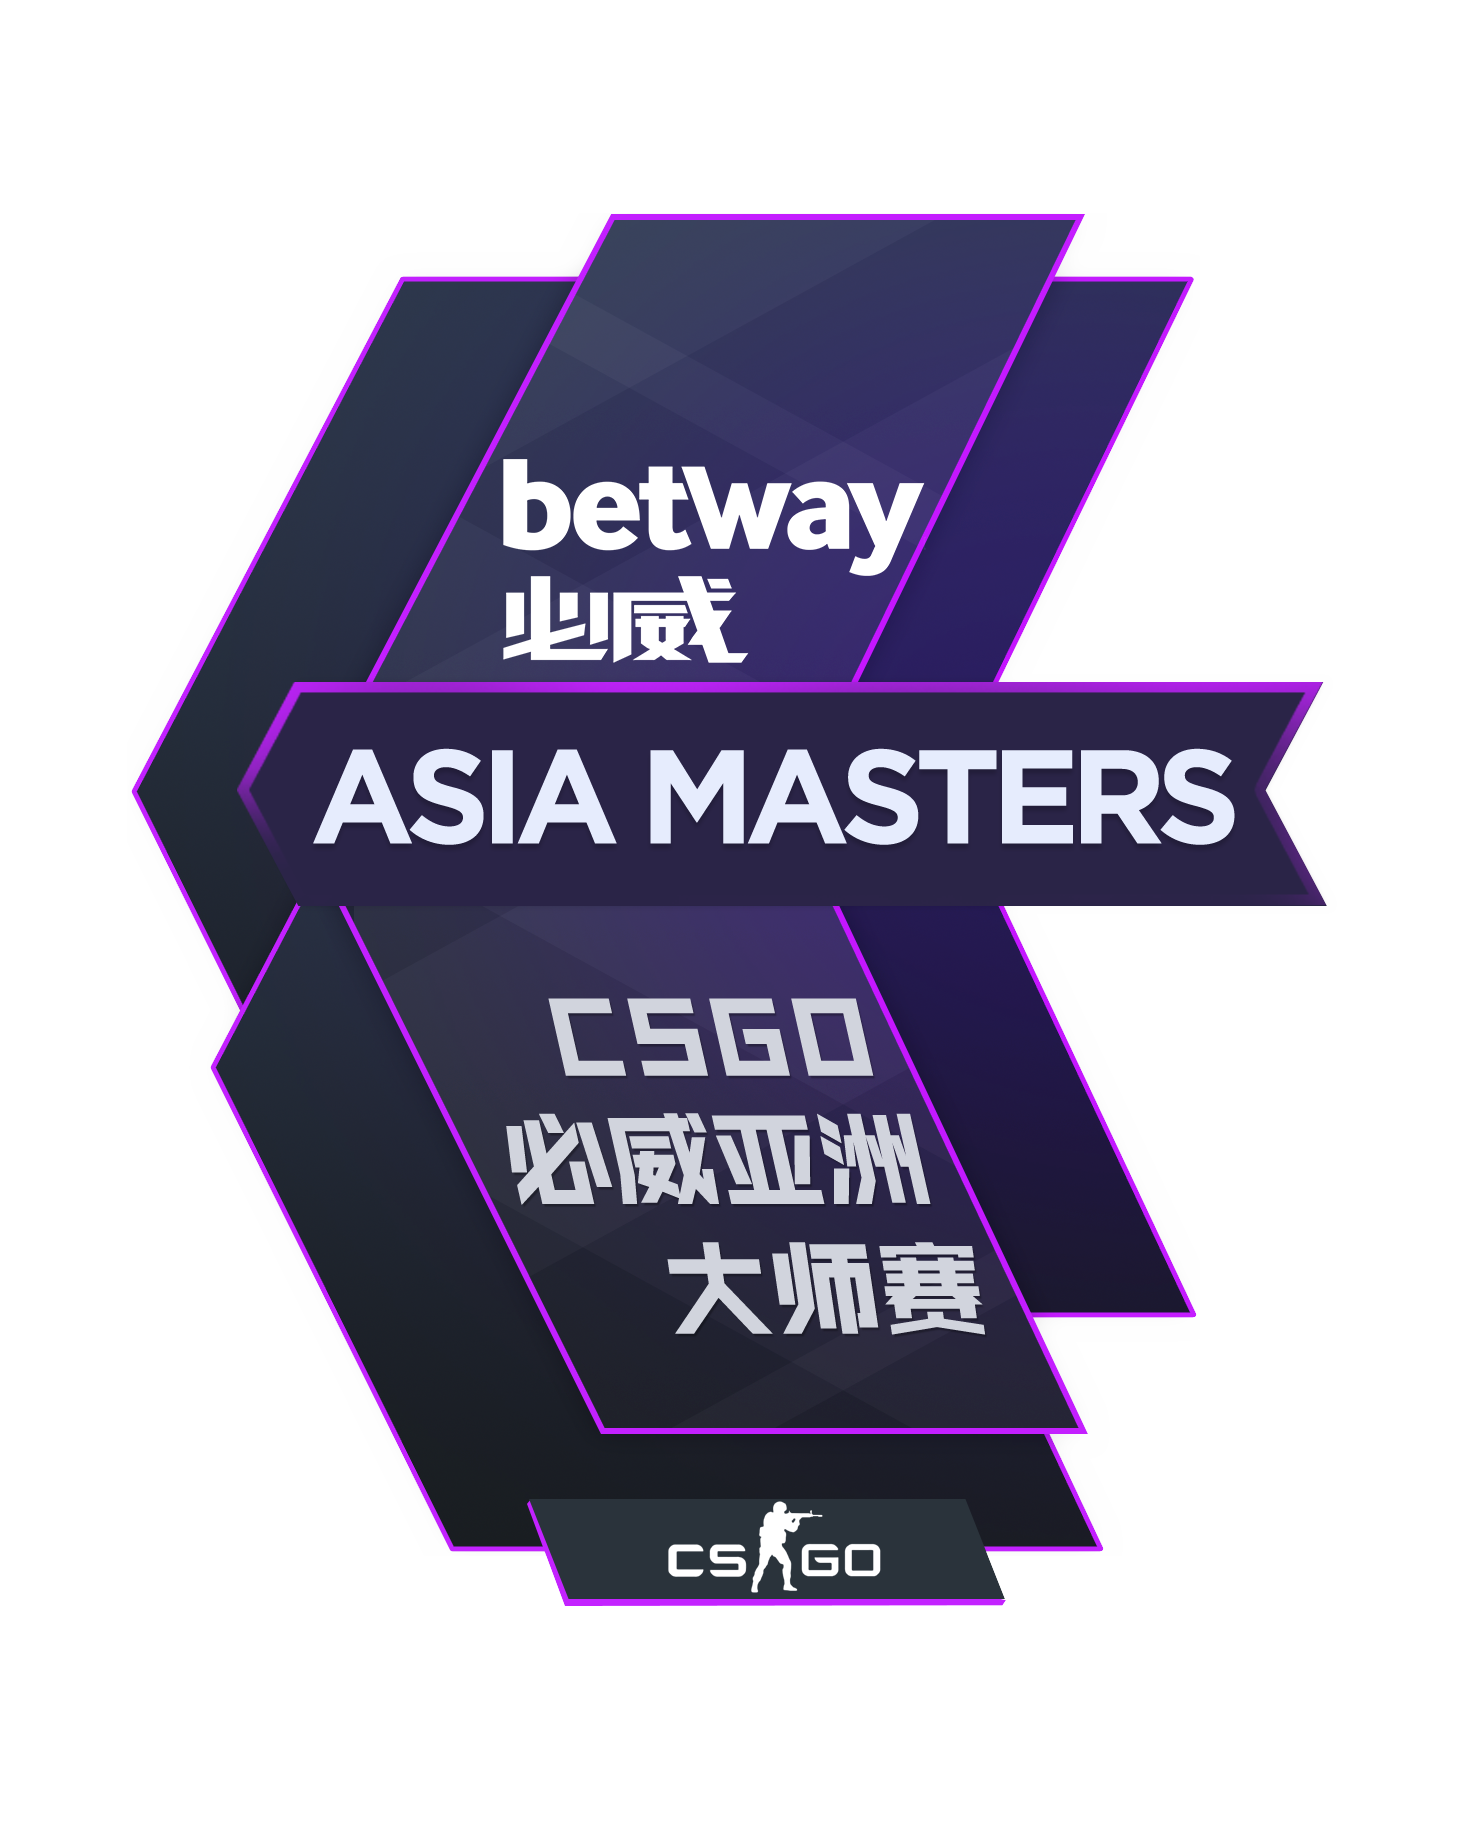 Betway Asia Masters CS:GO Series